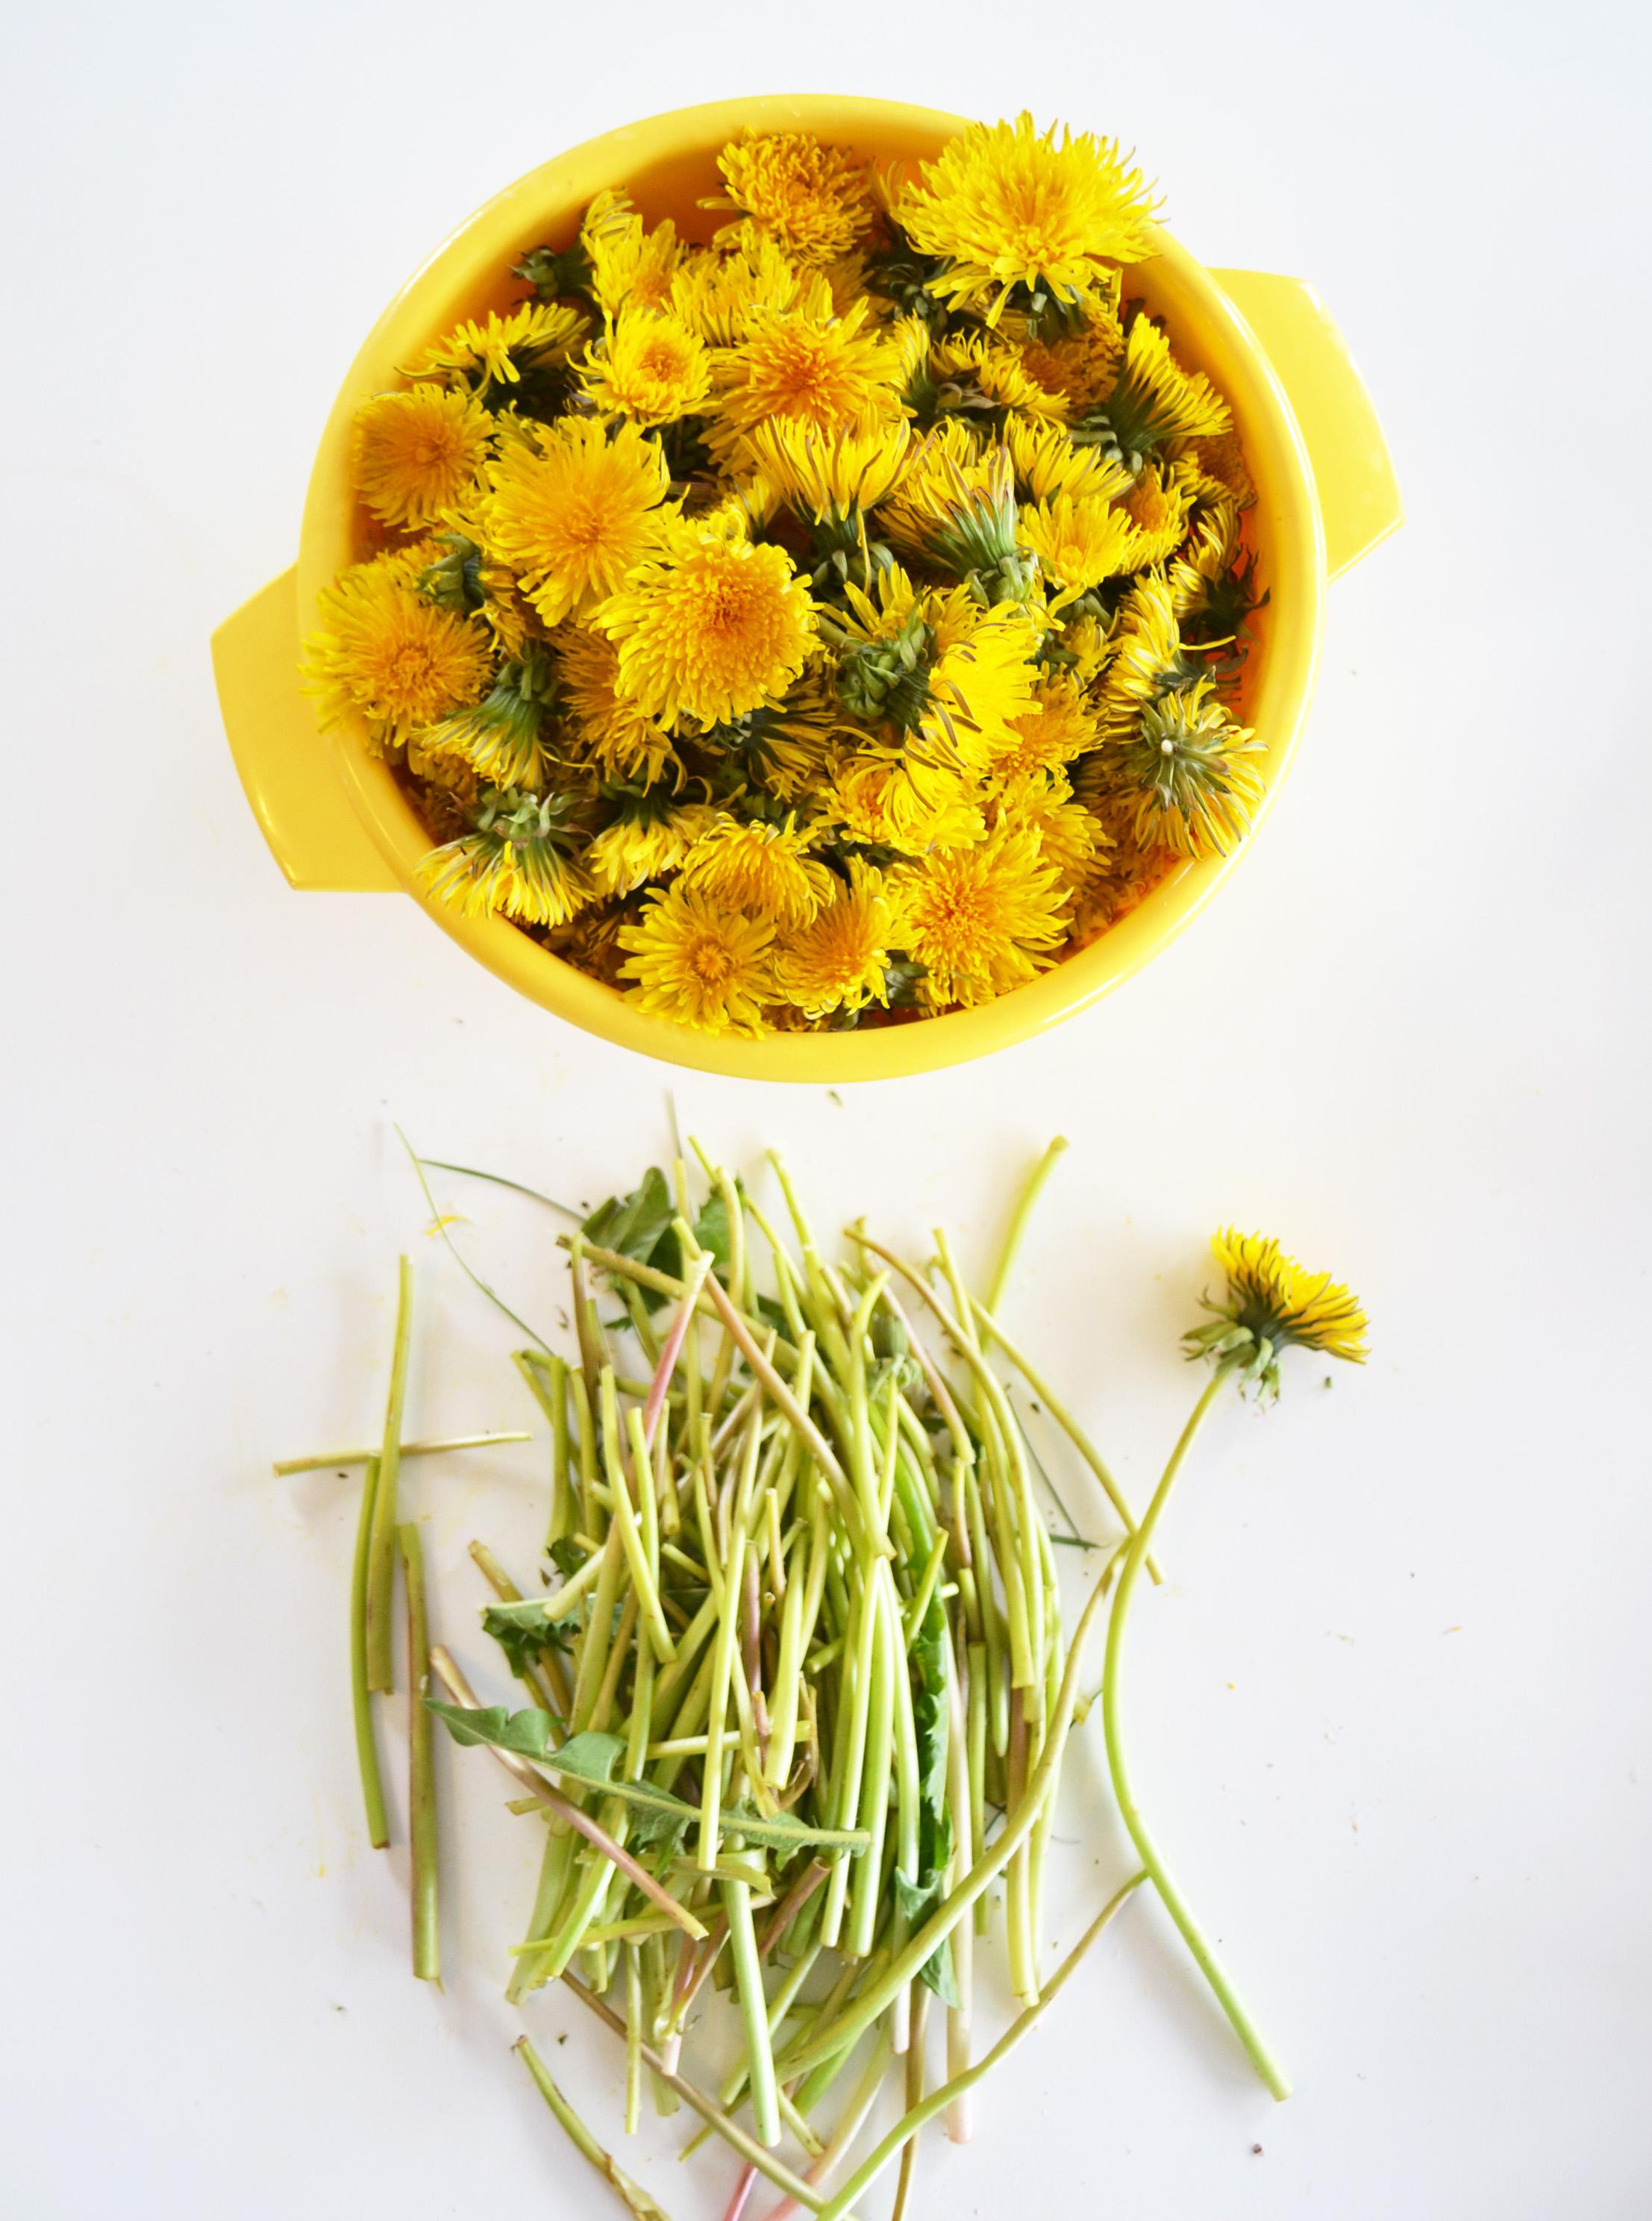 miele di tarrasaco